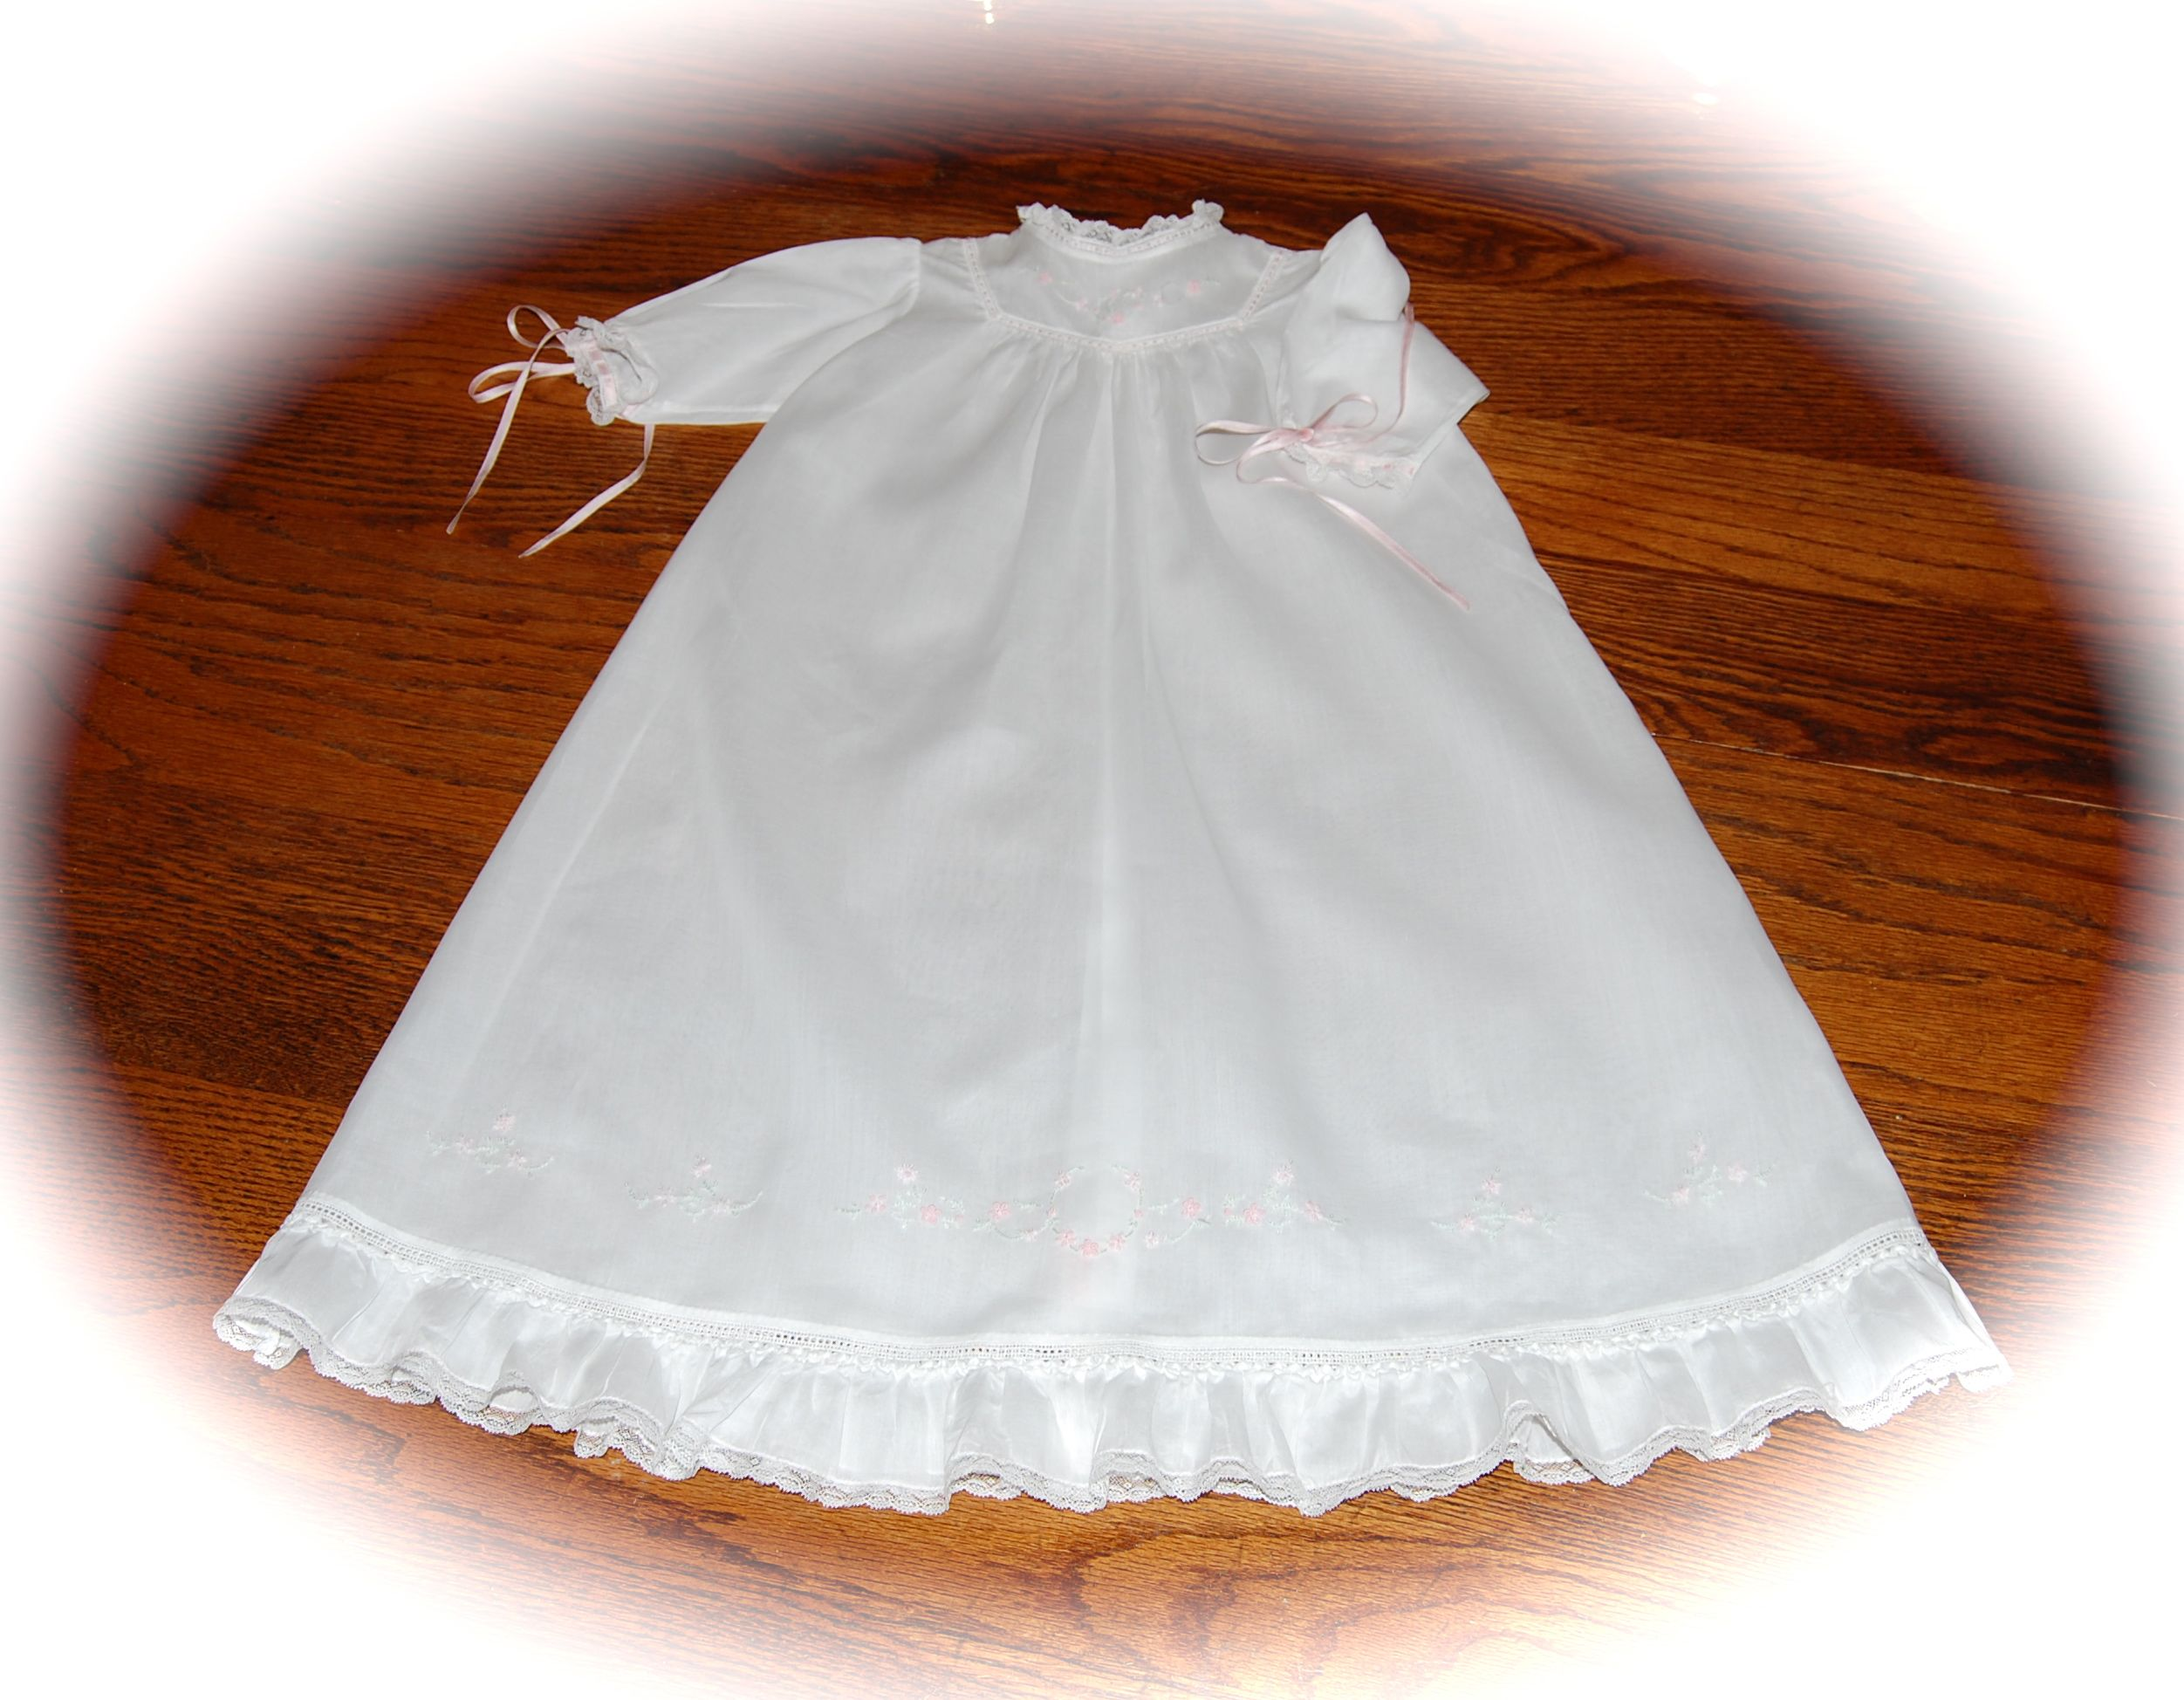 Dorothy's Circa 1920 French Handsewn Baby Pattern